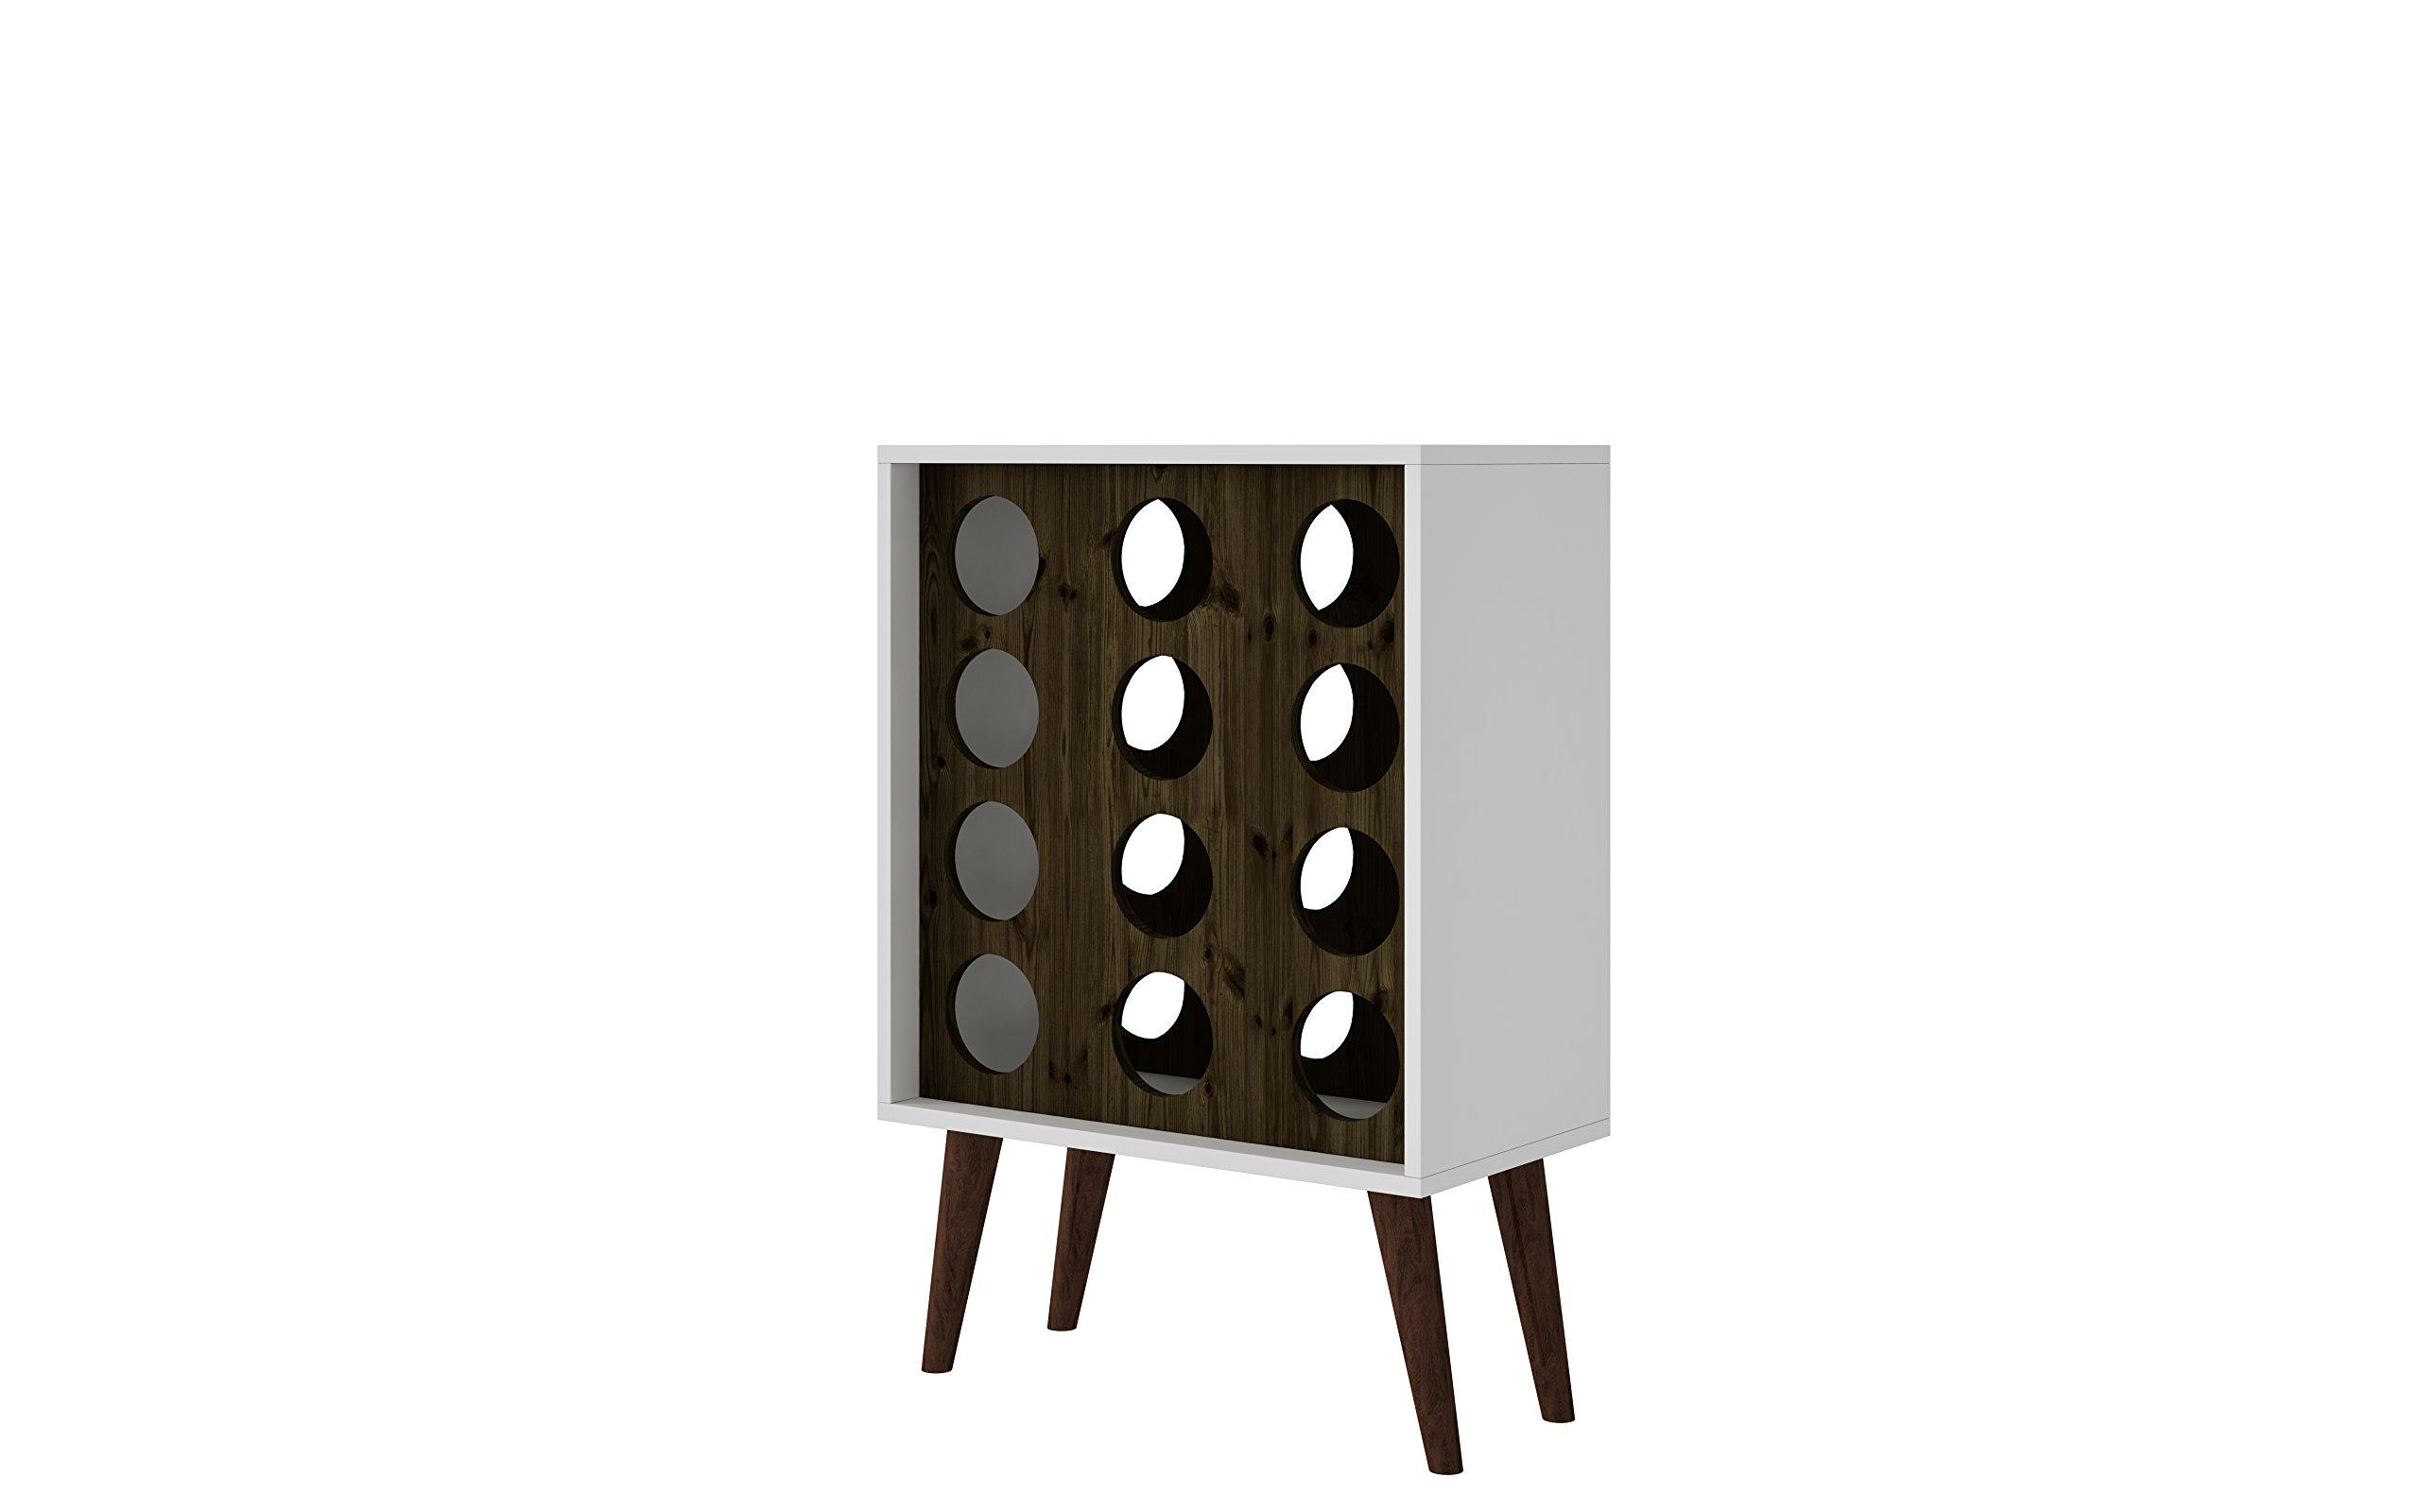 Manhattan Comfort Lund Collection Modern Square Design Reclaimed Wine Bar Cabinet, Holds 12 Bottles, White/Wood